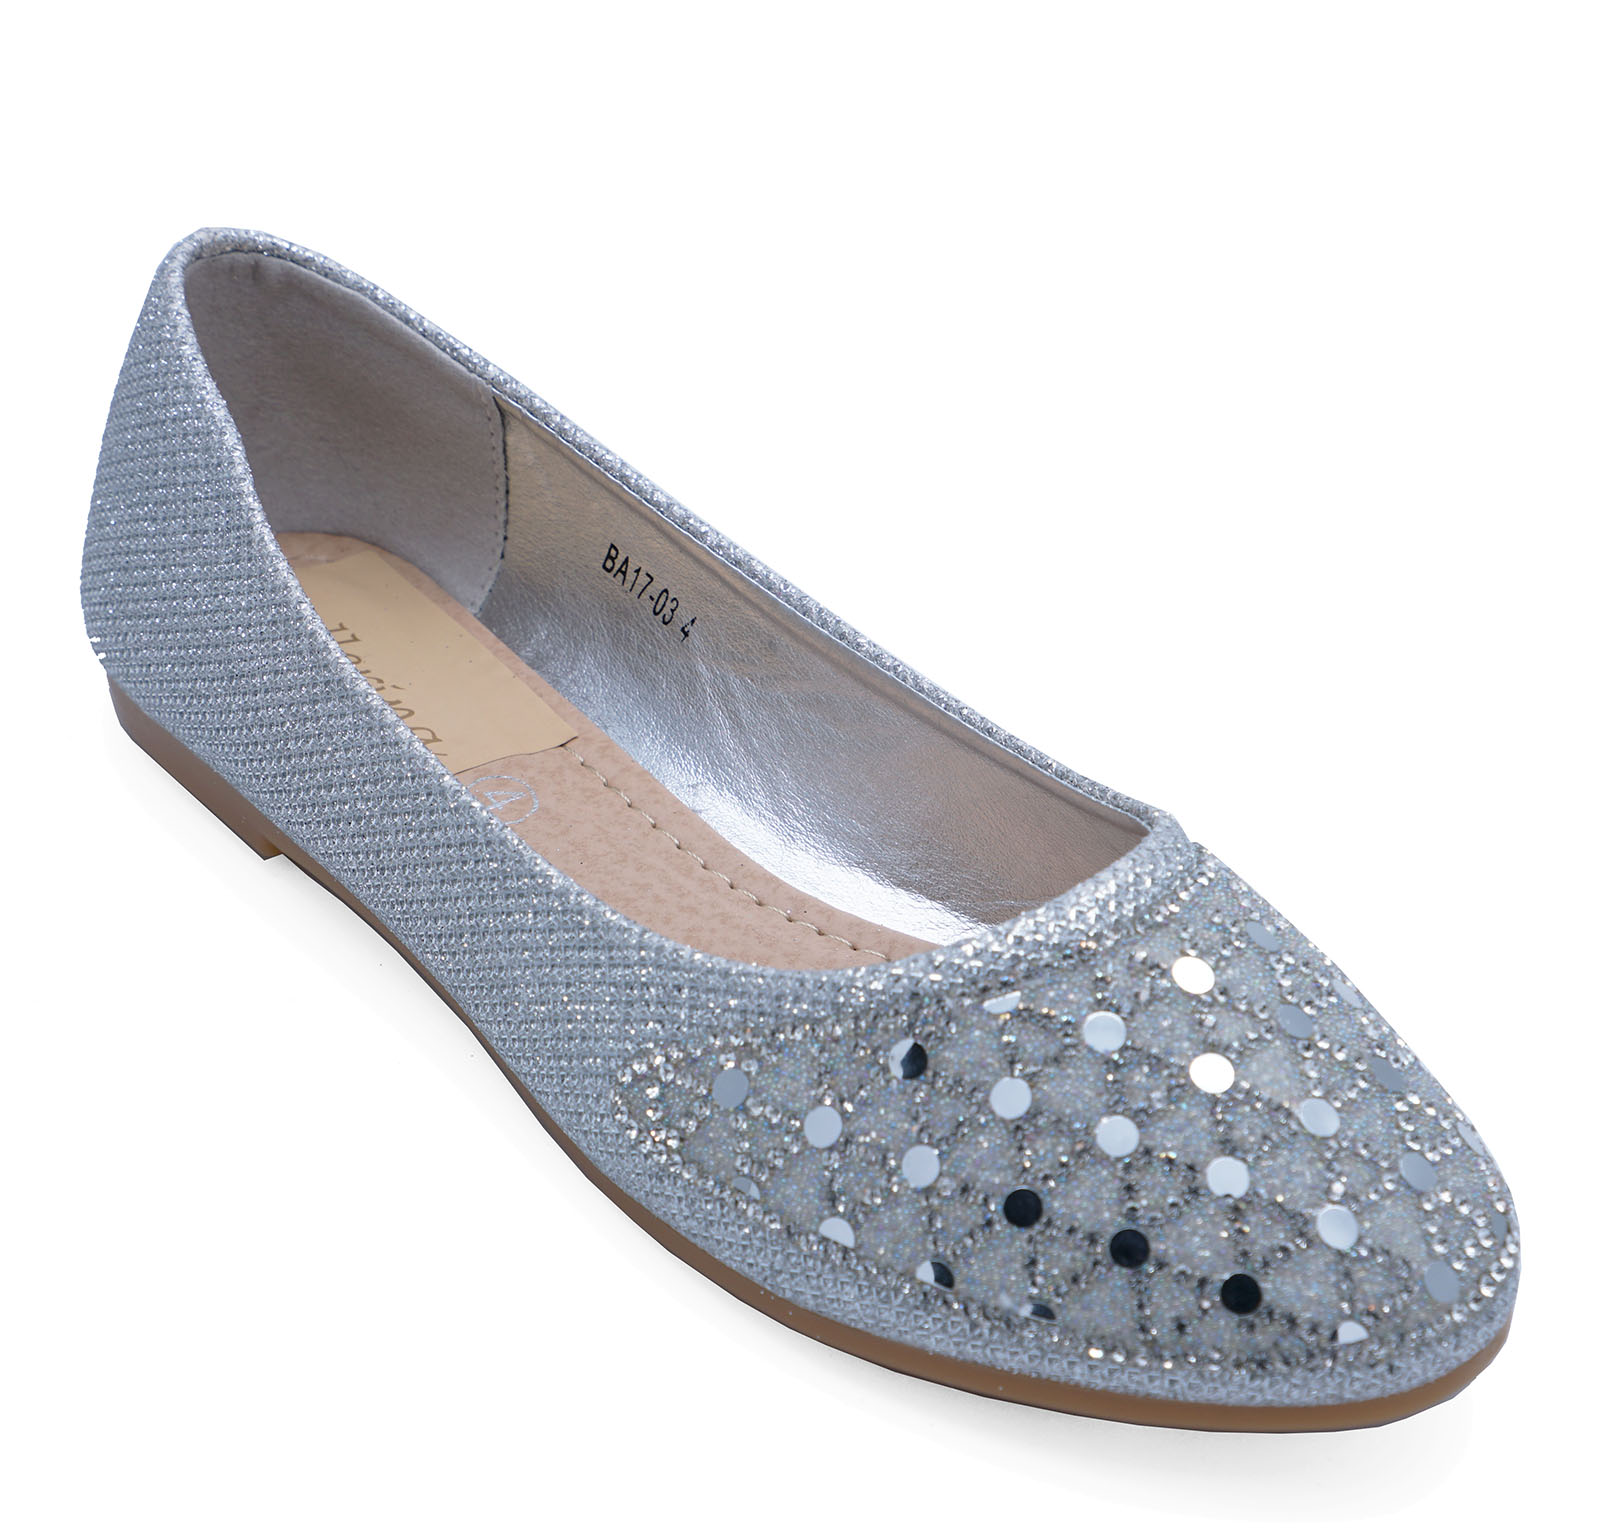 WOMENS-FLAT-SILVER-SLIP-ON-WEDDING-BRIDESMAID-BRIDAL-PARTY-SHOES-BALLET-PUMPS-3